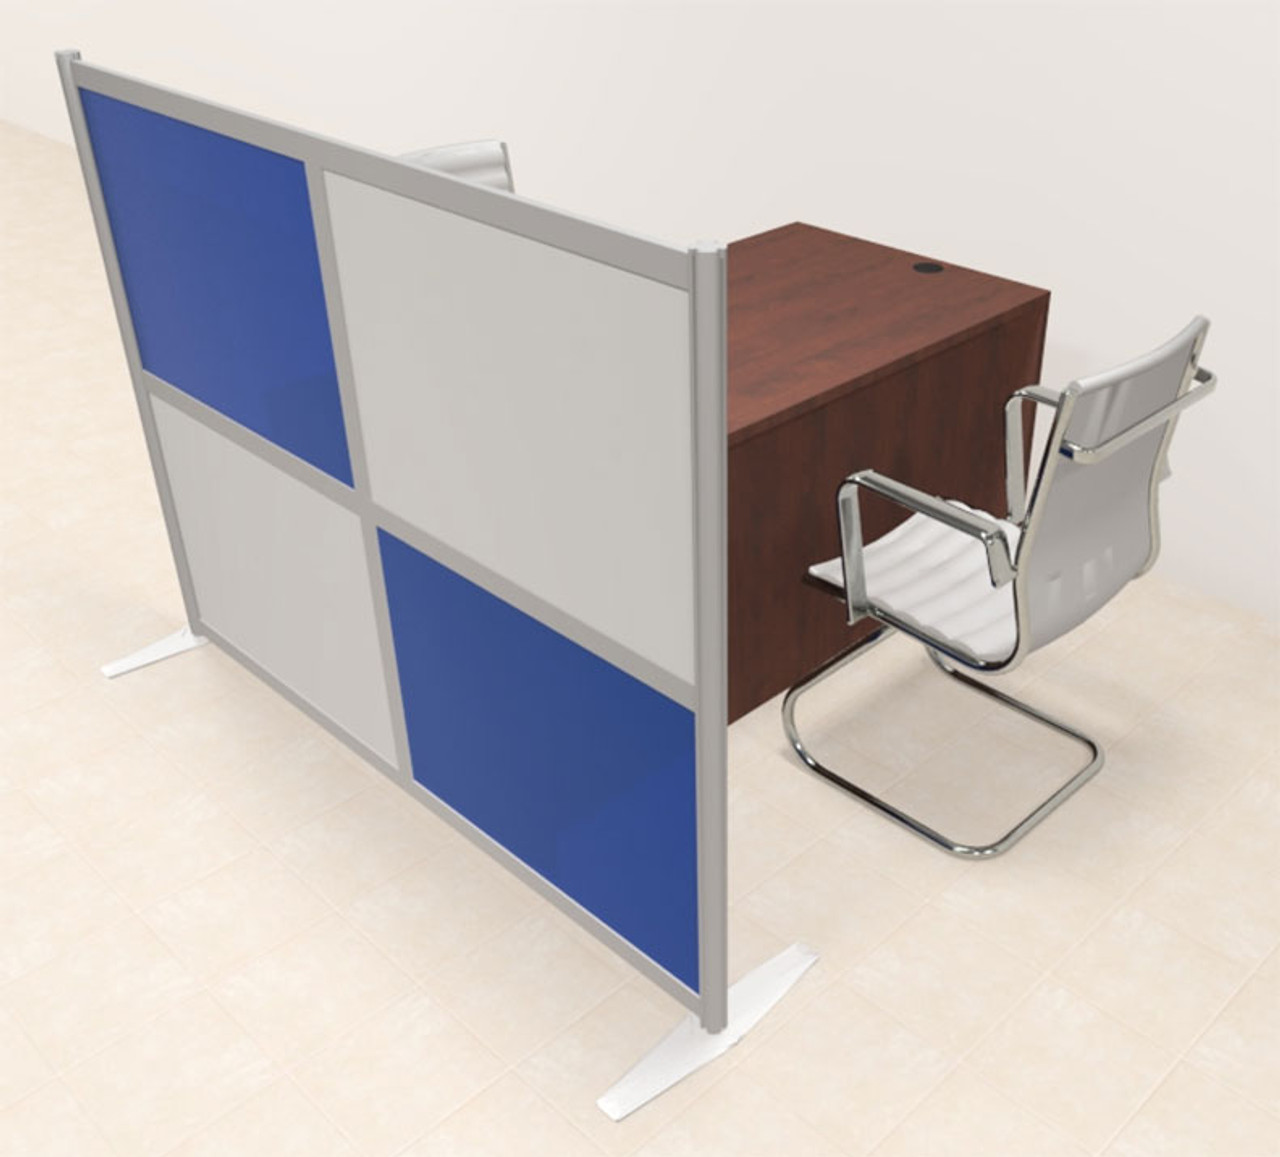 One Person Workstation w/Acrylic Aluminum Privacy Panel, #OT-SUL-HPB50